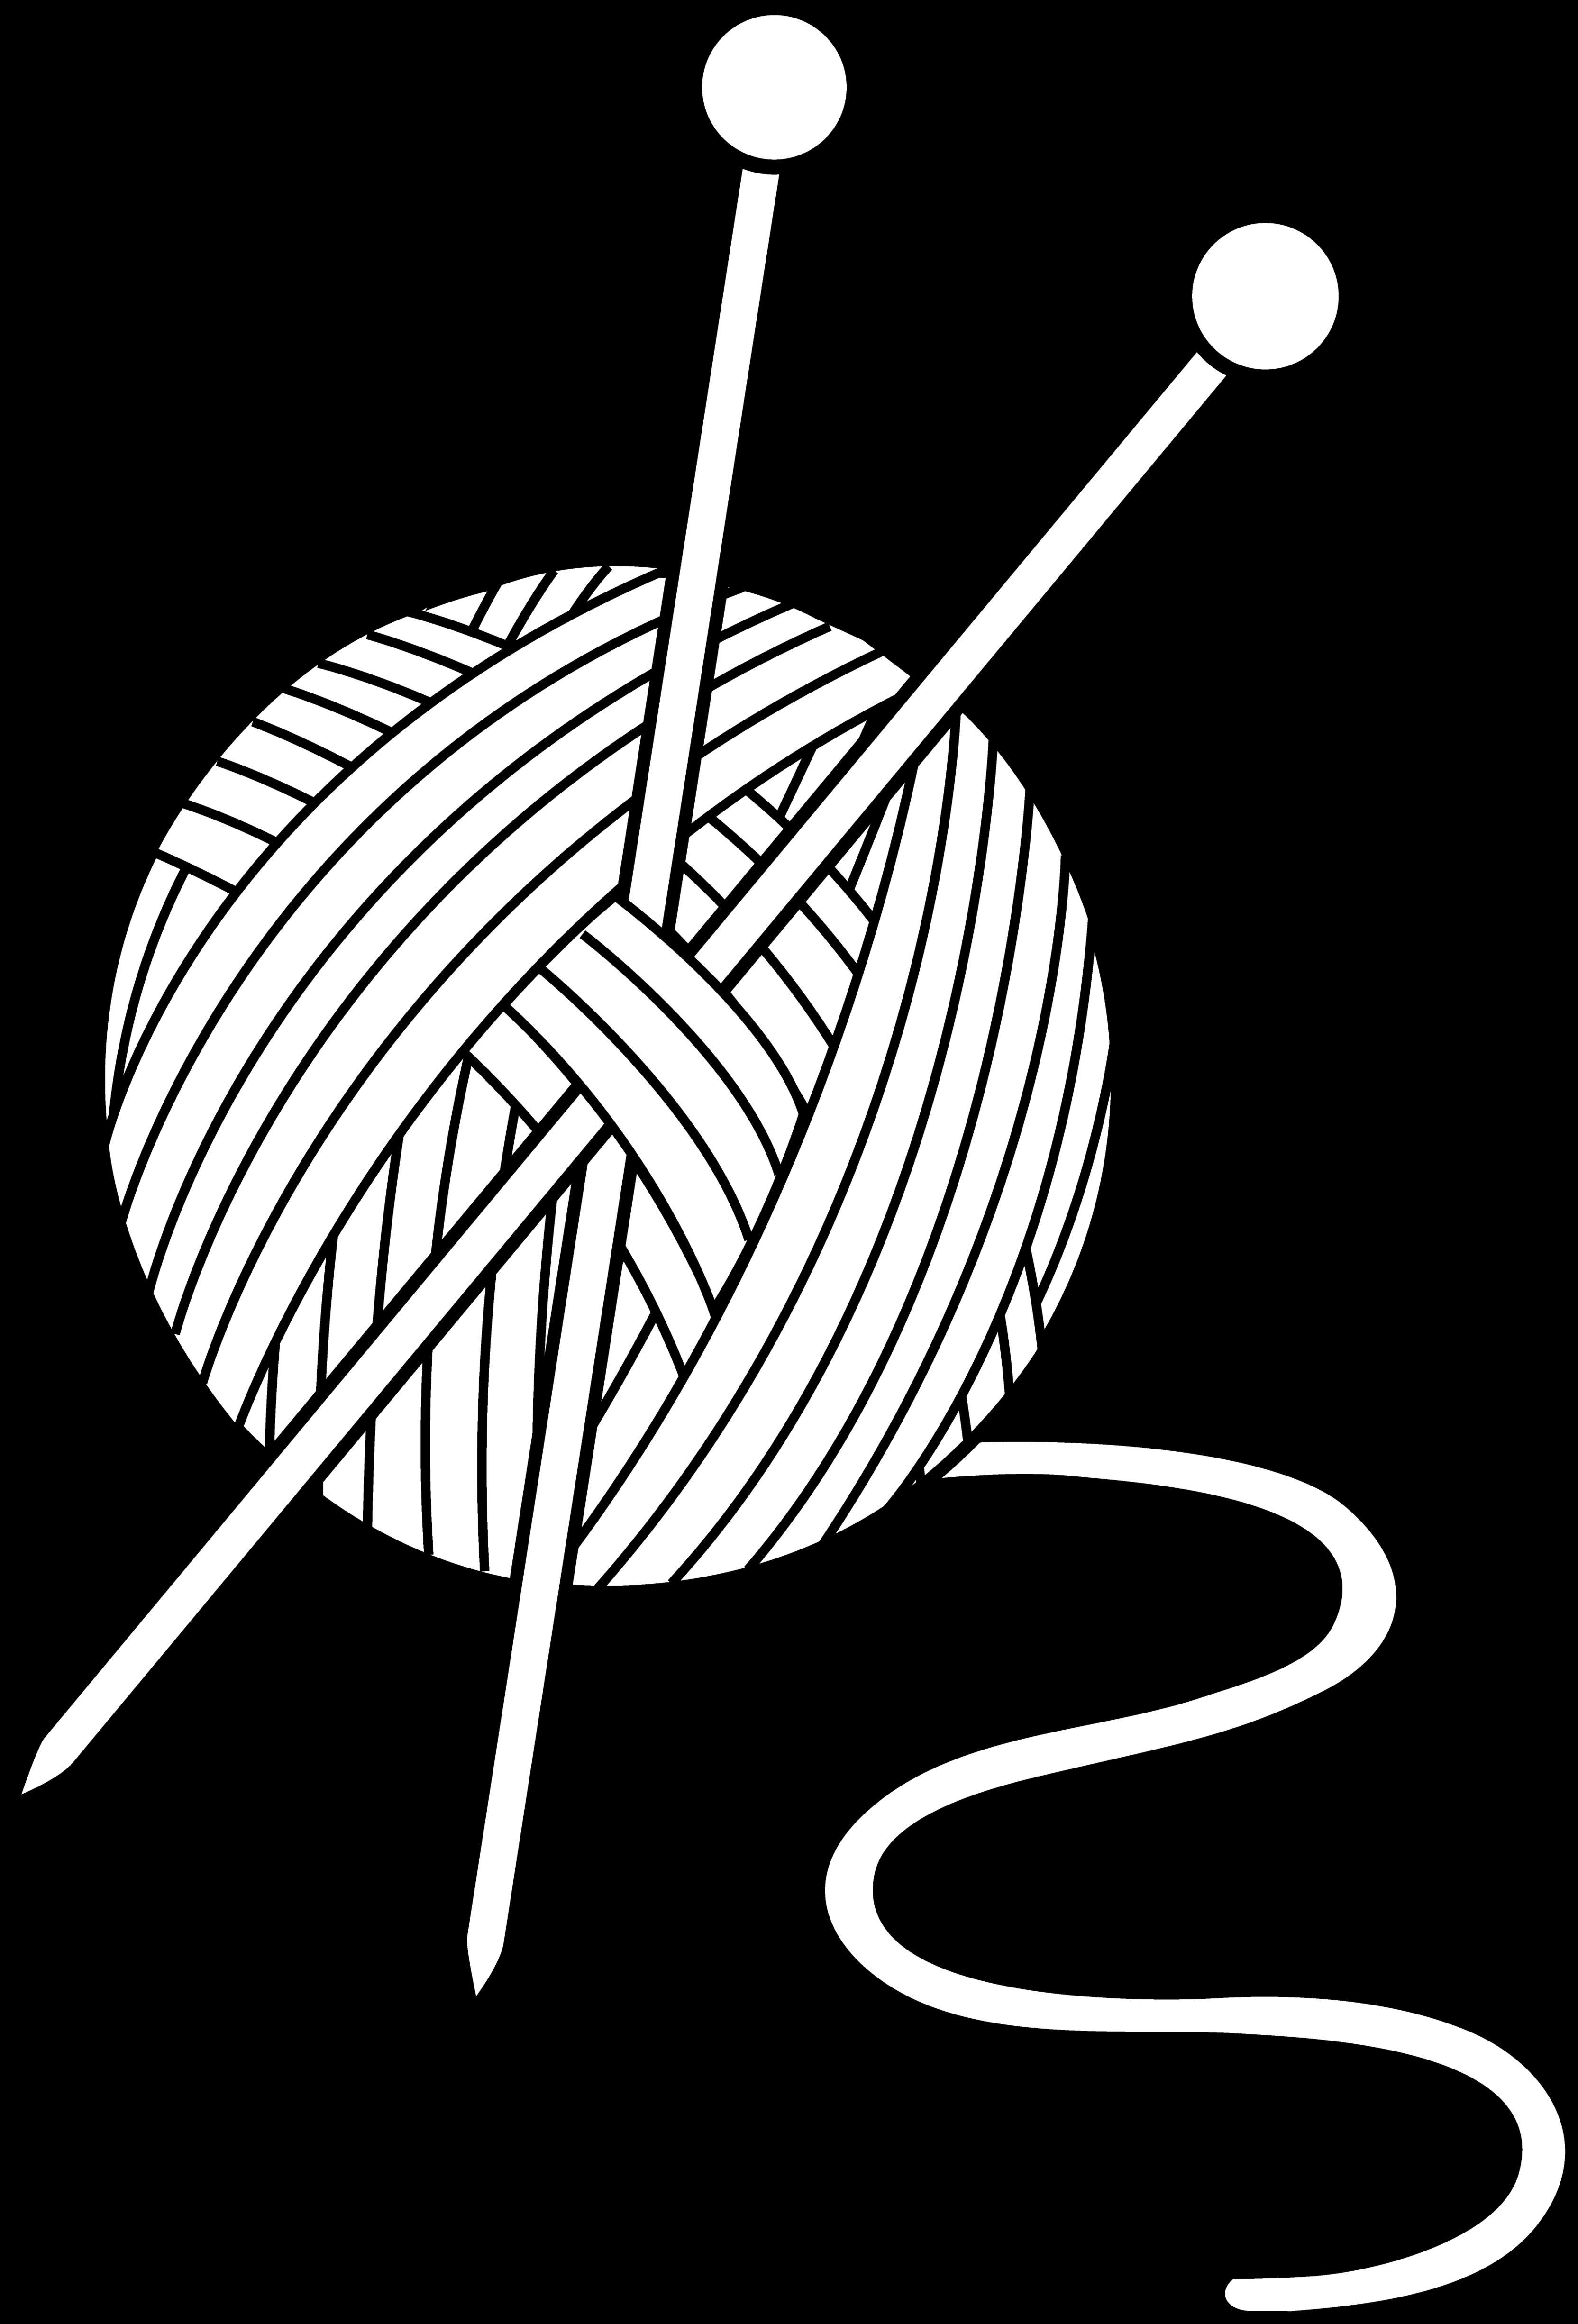 yarn ball drawing at getdrawings com free for personal use yarn